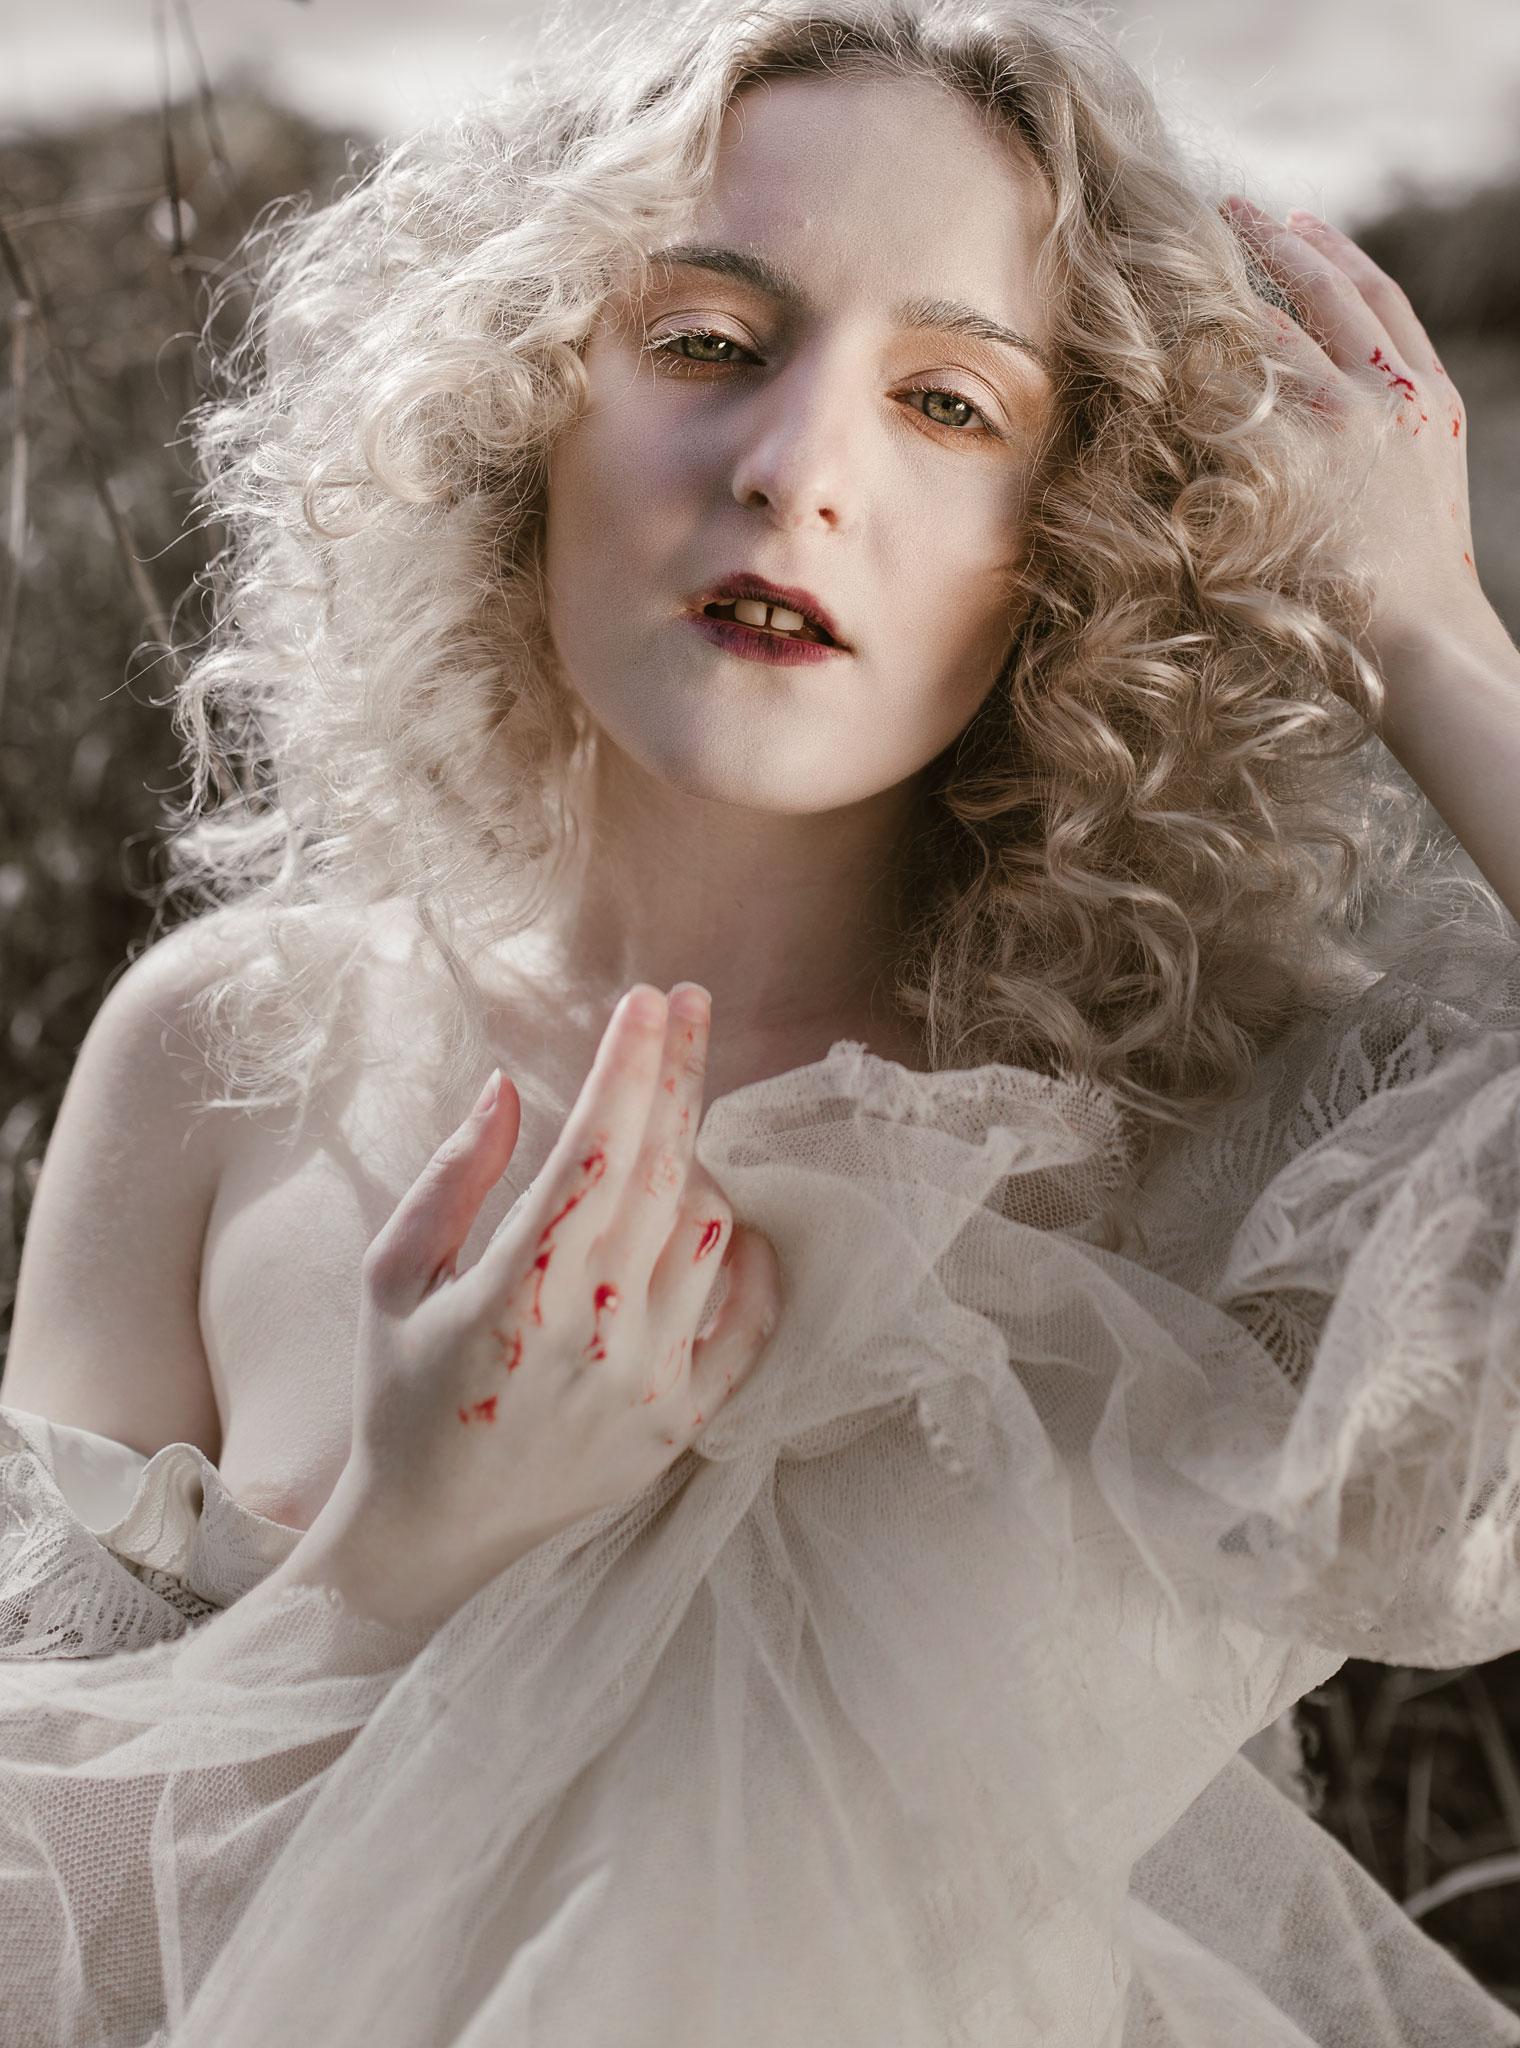 pale-witch-095fb.jpg